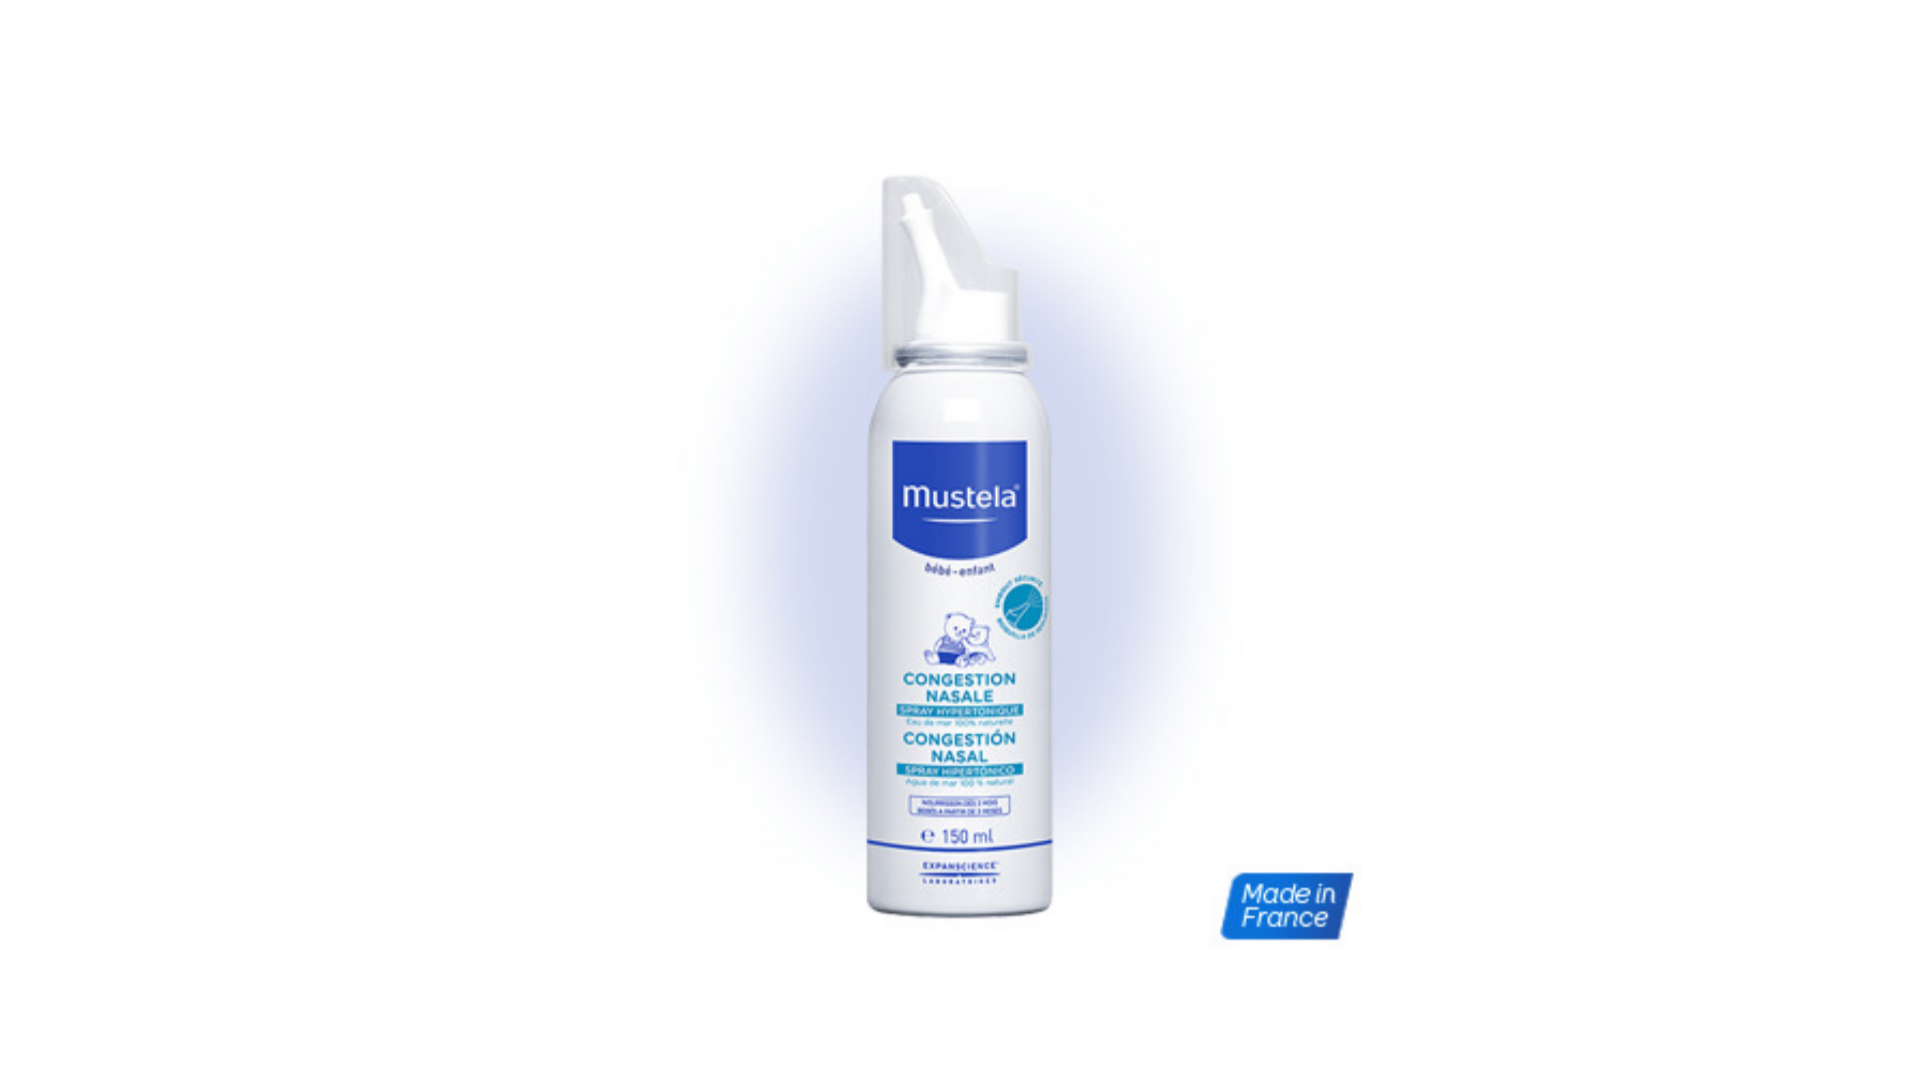 Mustela | Spray Congestão Nasal 150ml